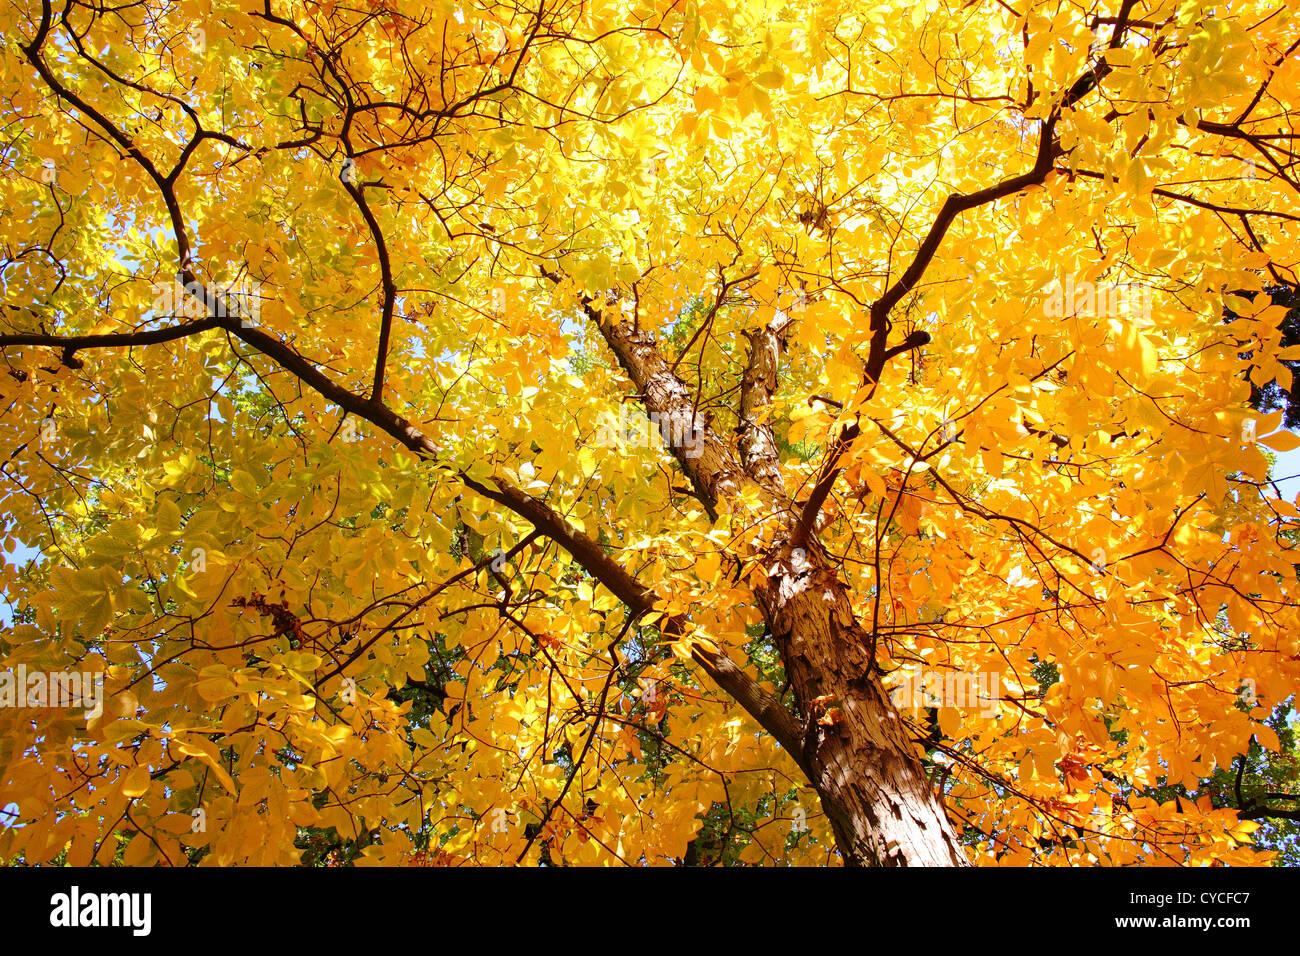 Shagbark Hickory yallow autumn foliage in a sunny day Carya ovata - Stock Image